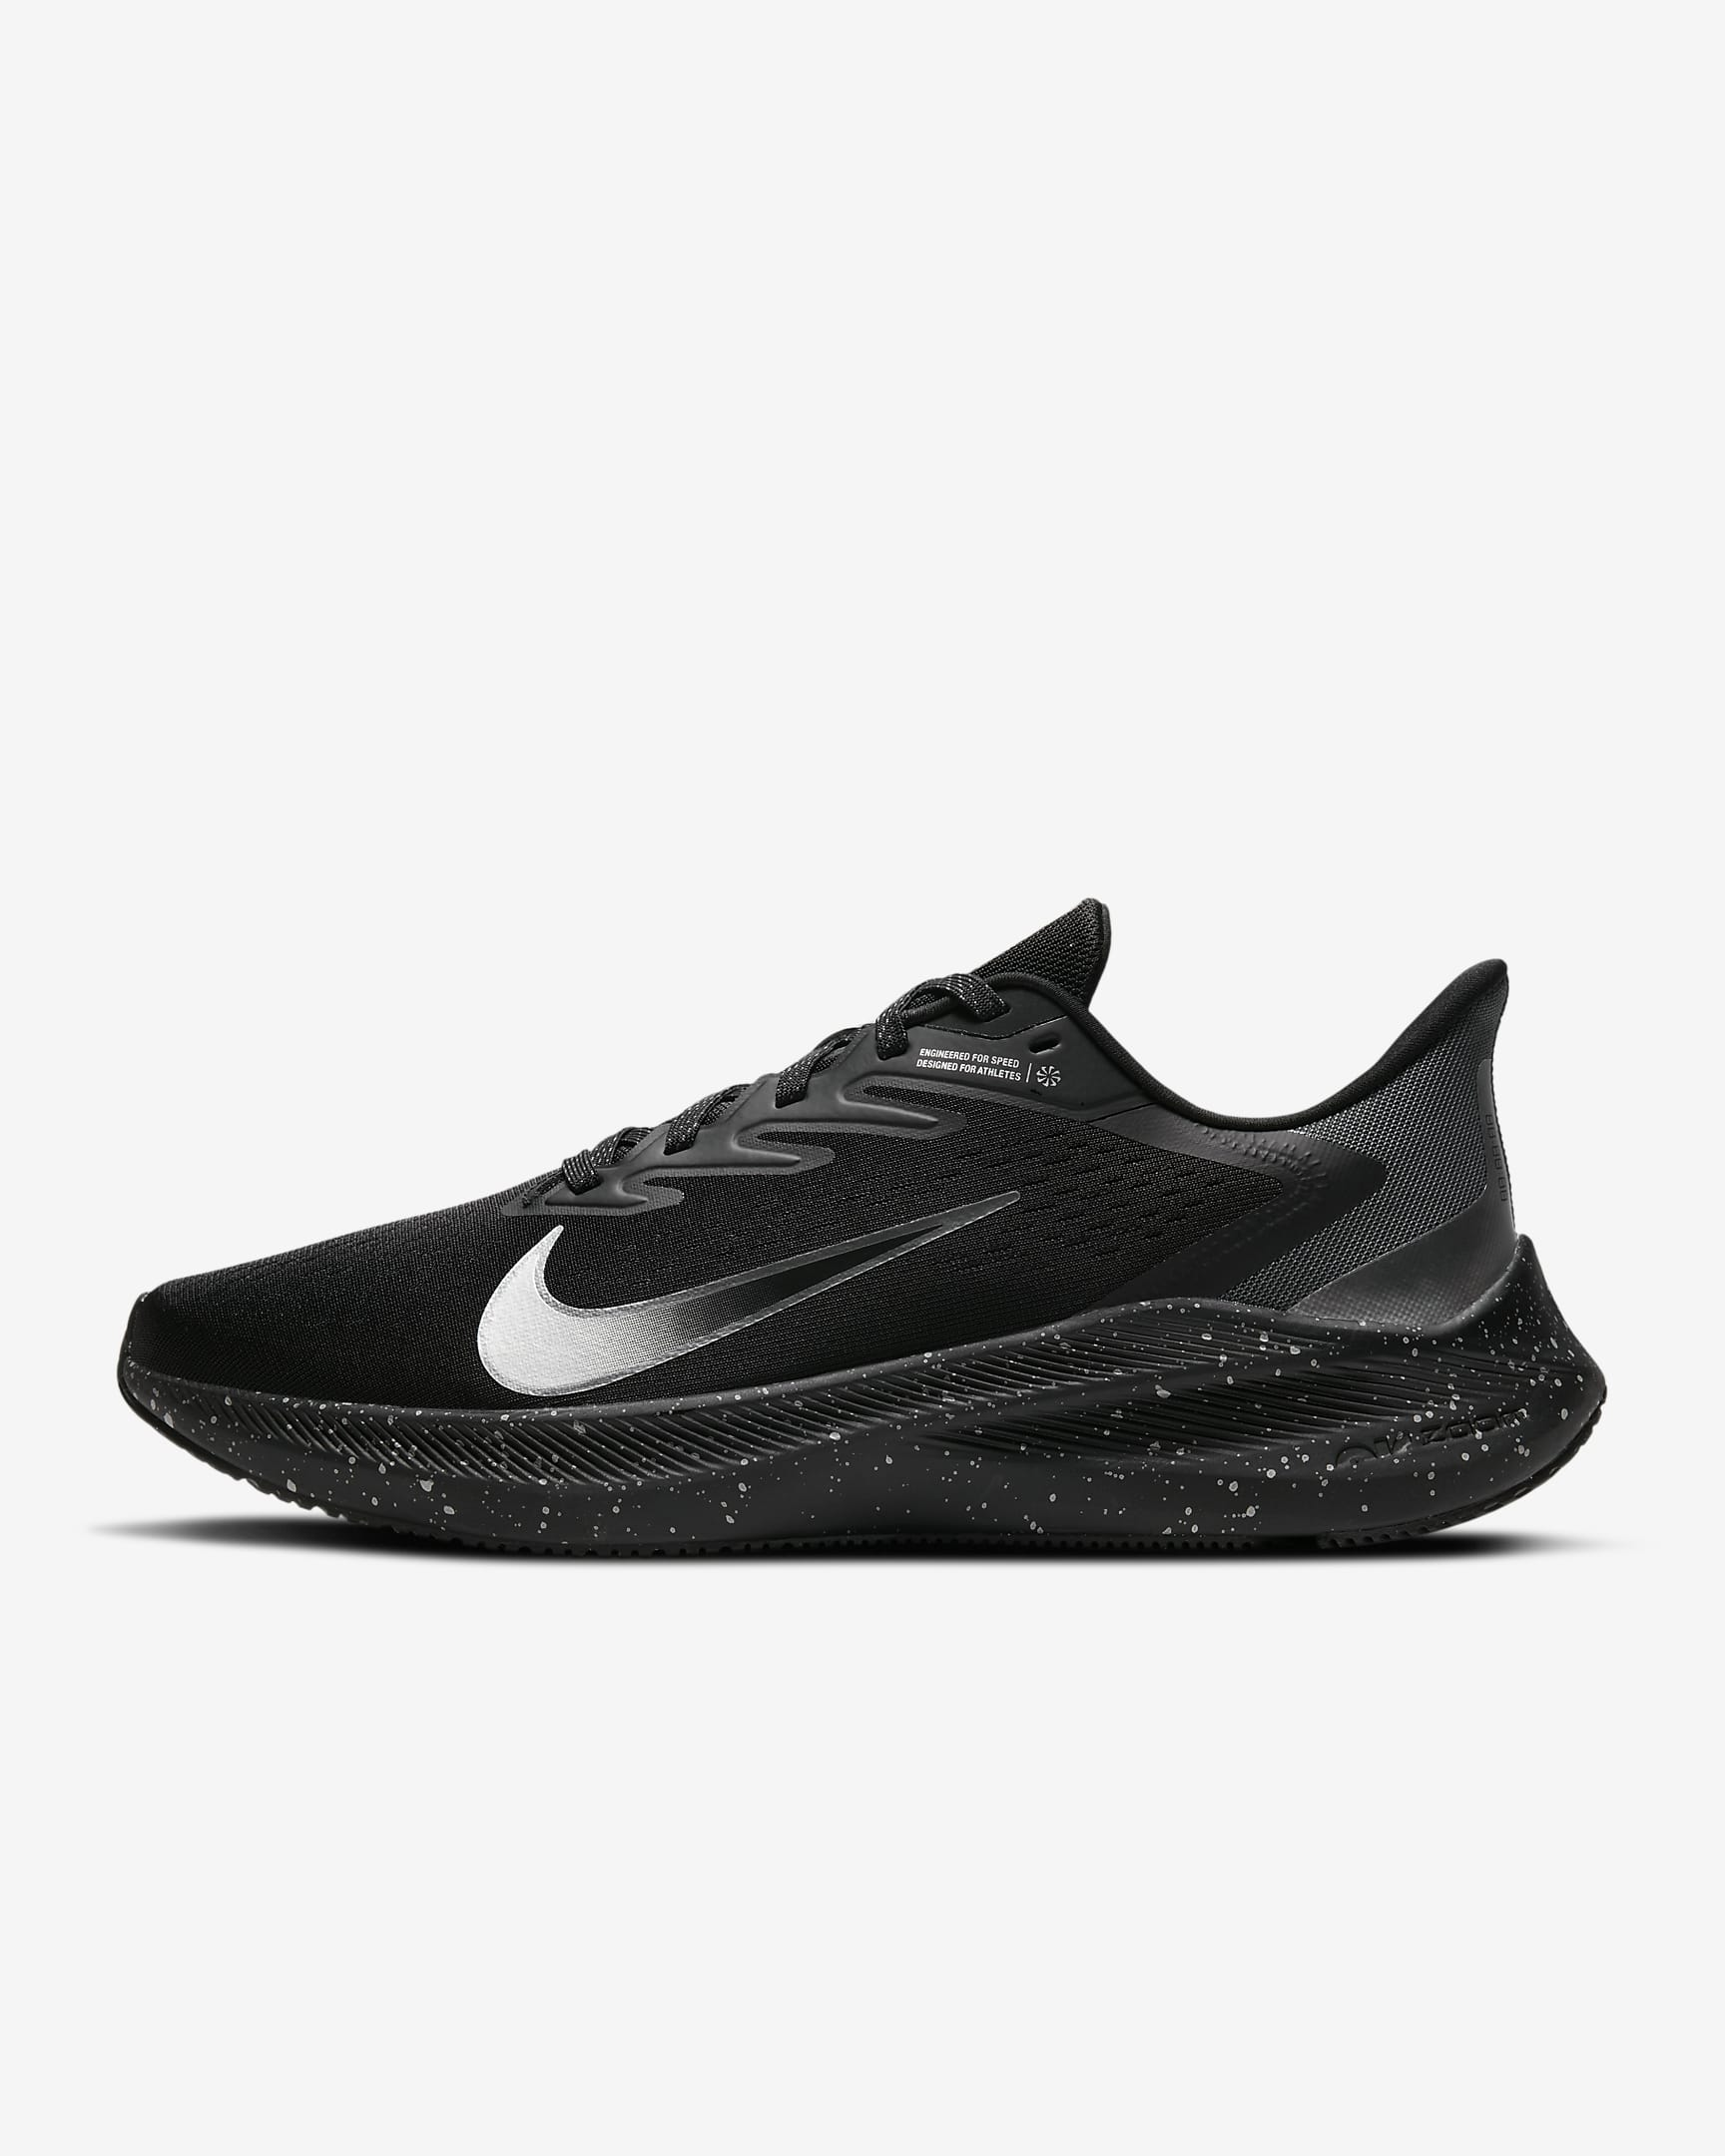 Nike Zoom Winflo 7 Premium For Men